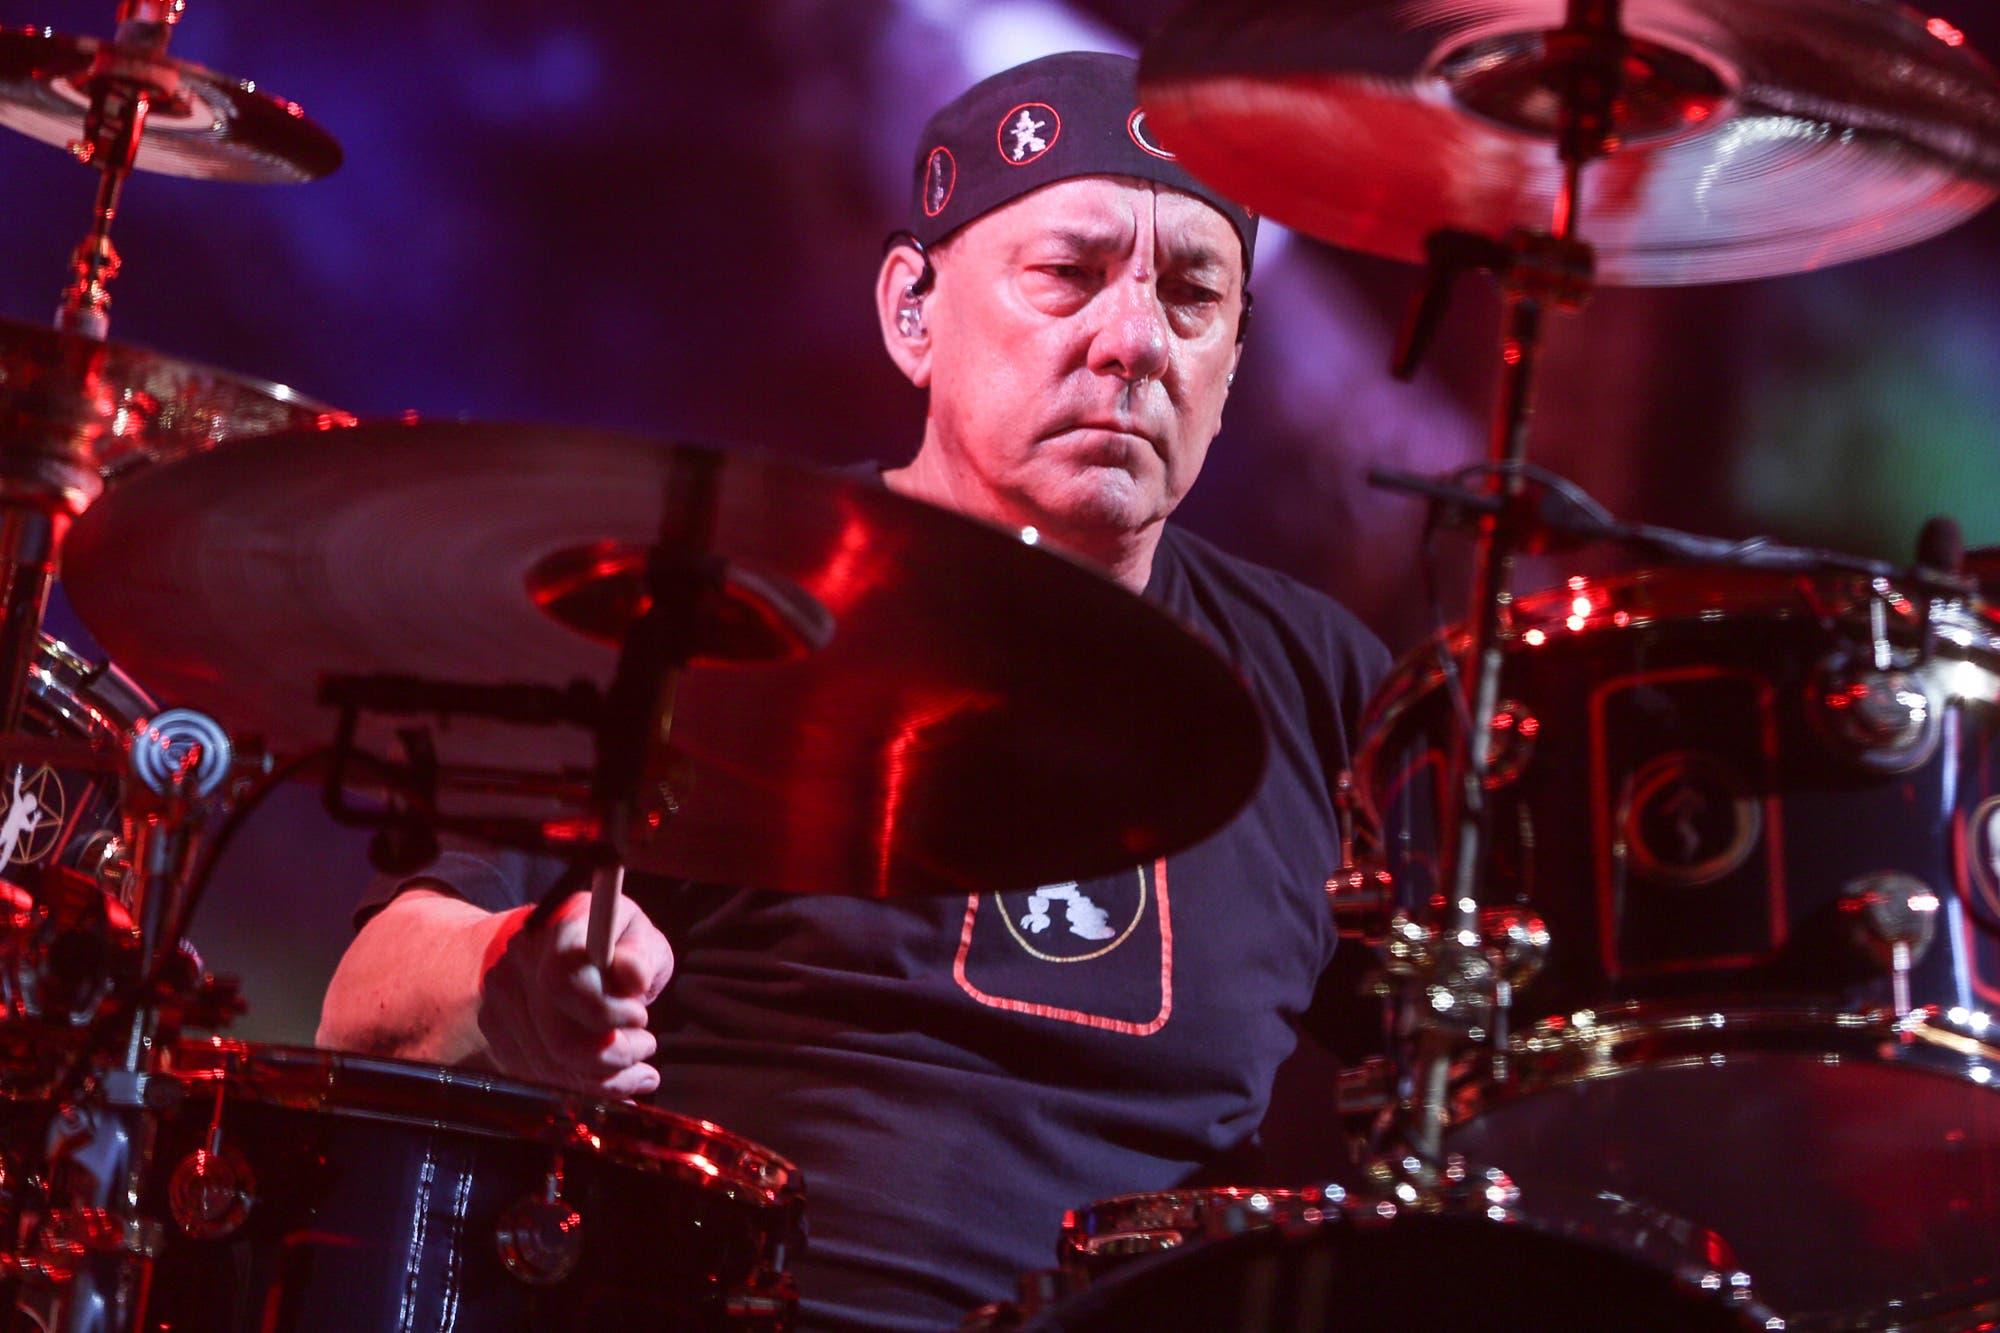 Murió el baterista de Rush, Neil Peart